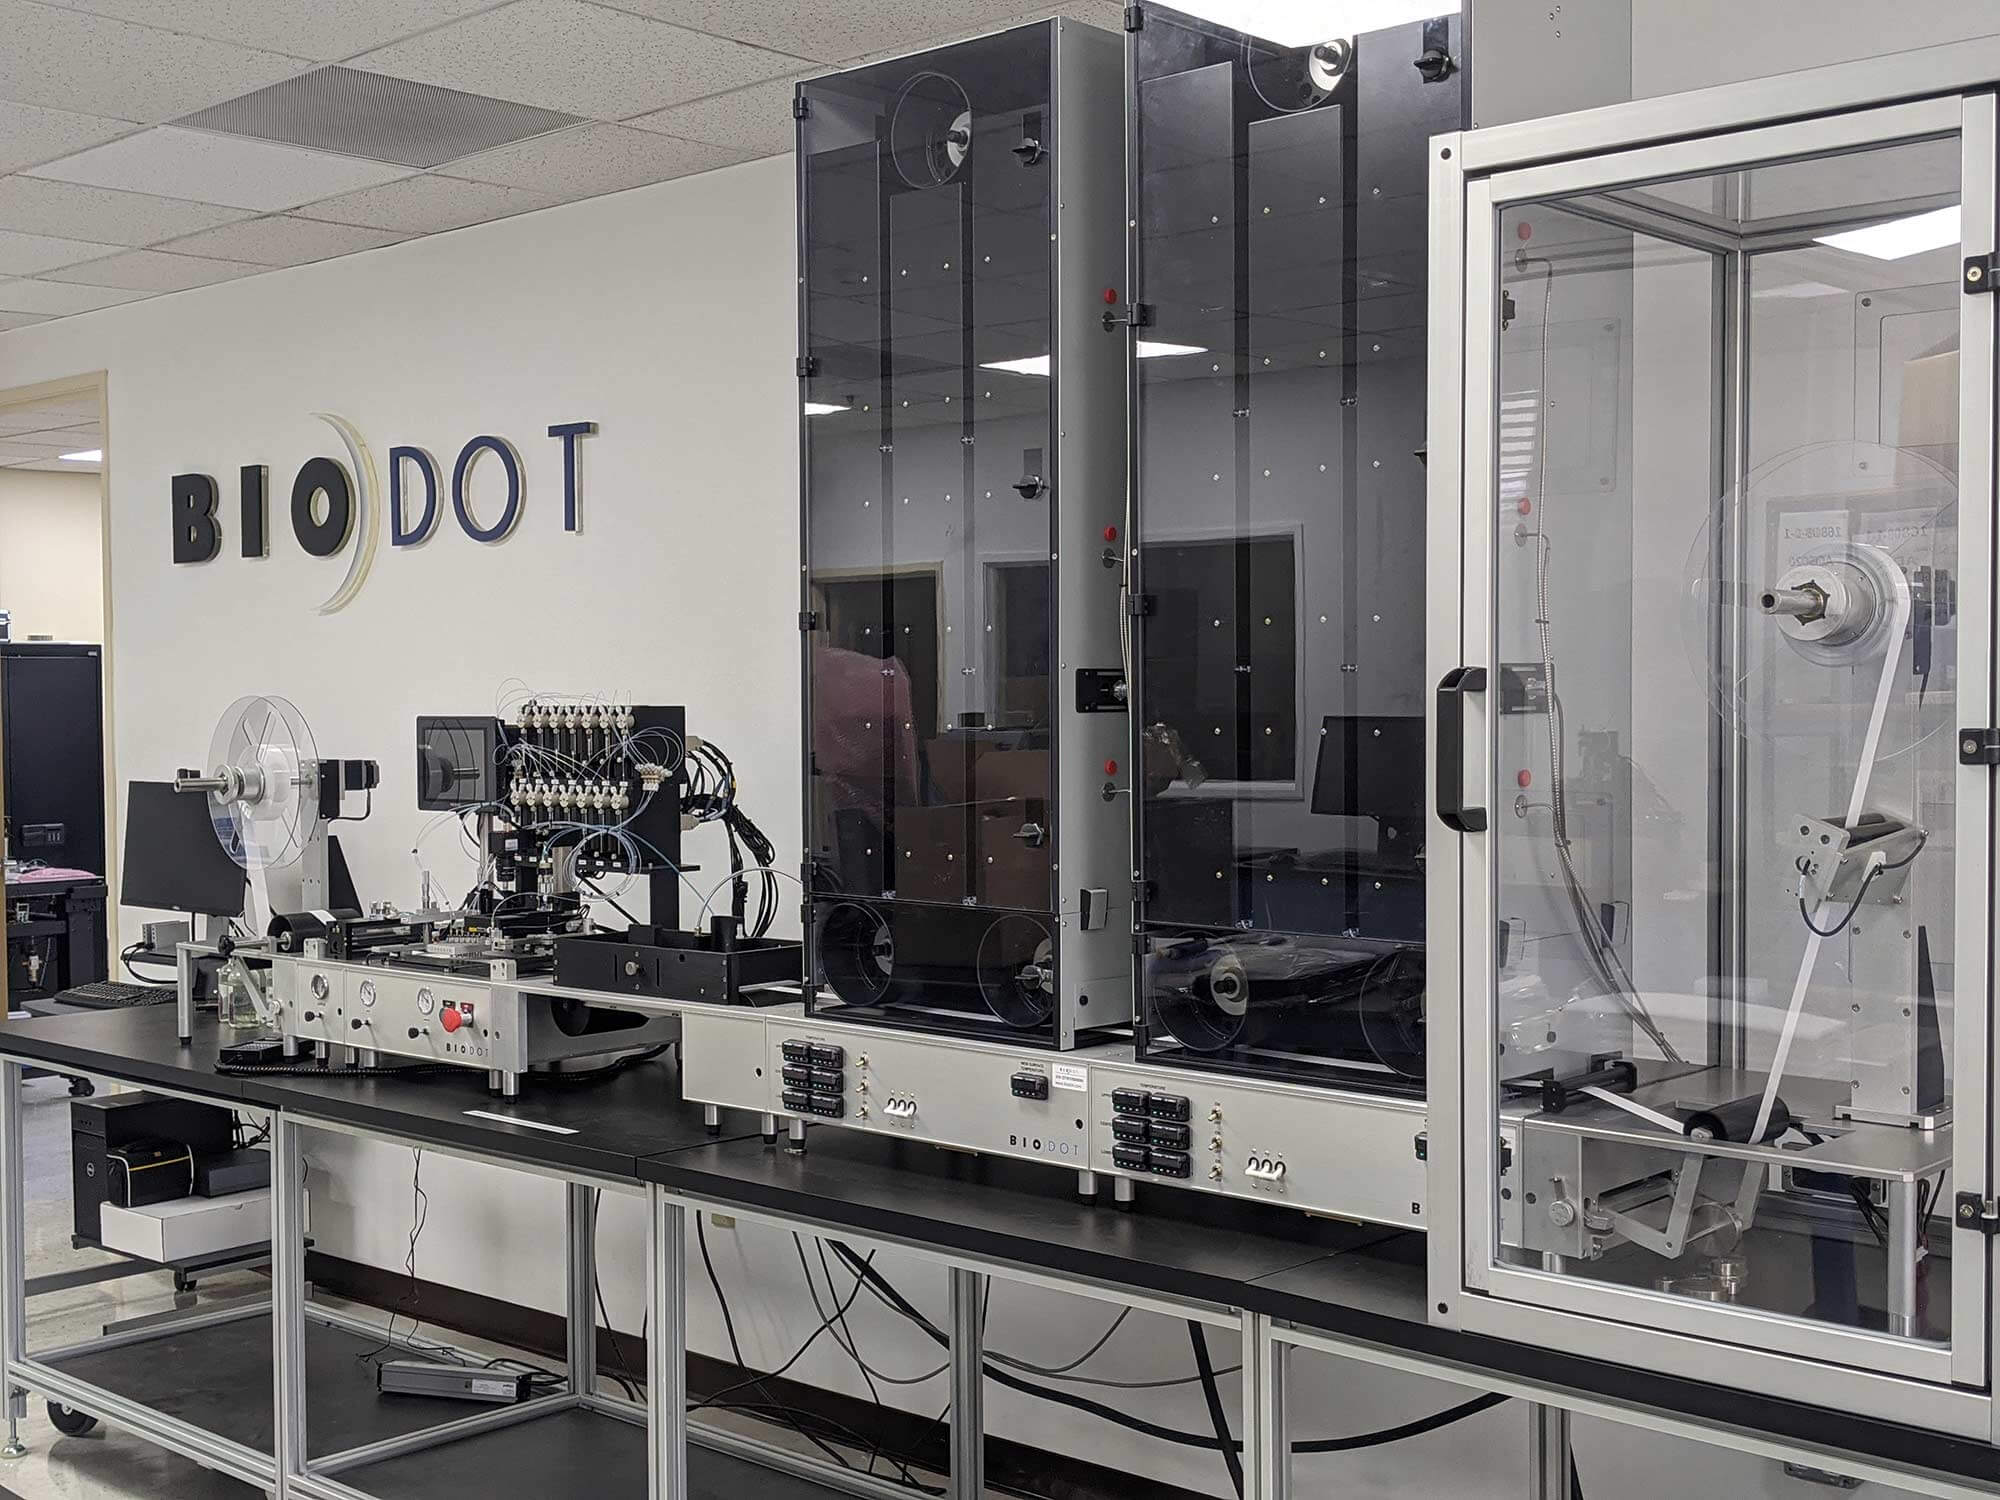 Laboratory Equipment Use